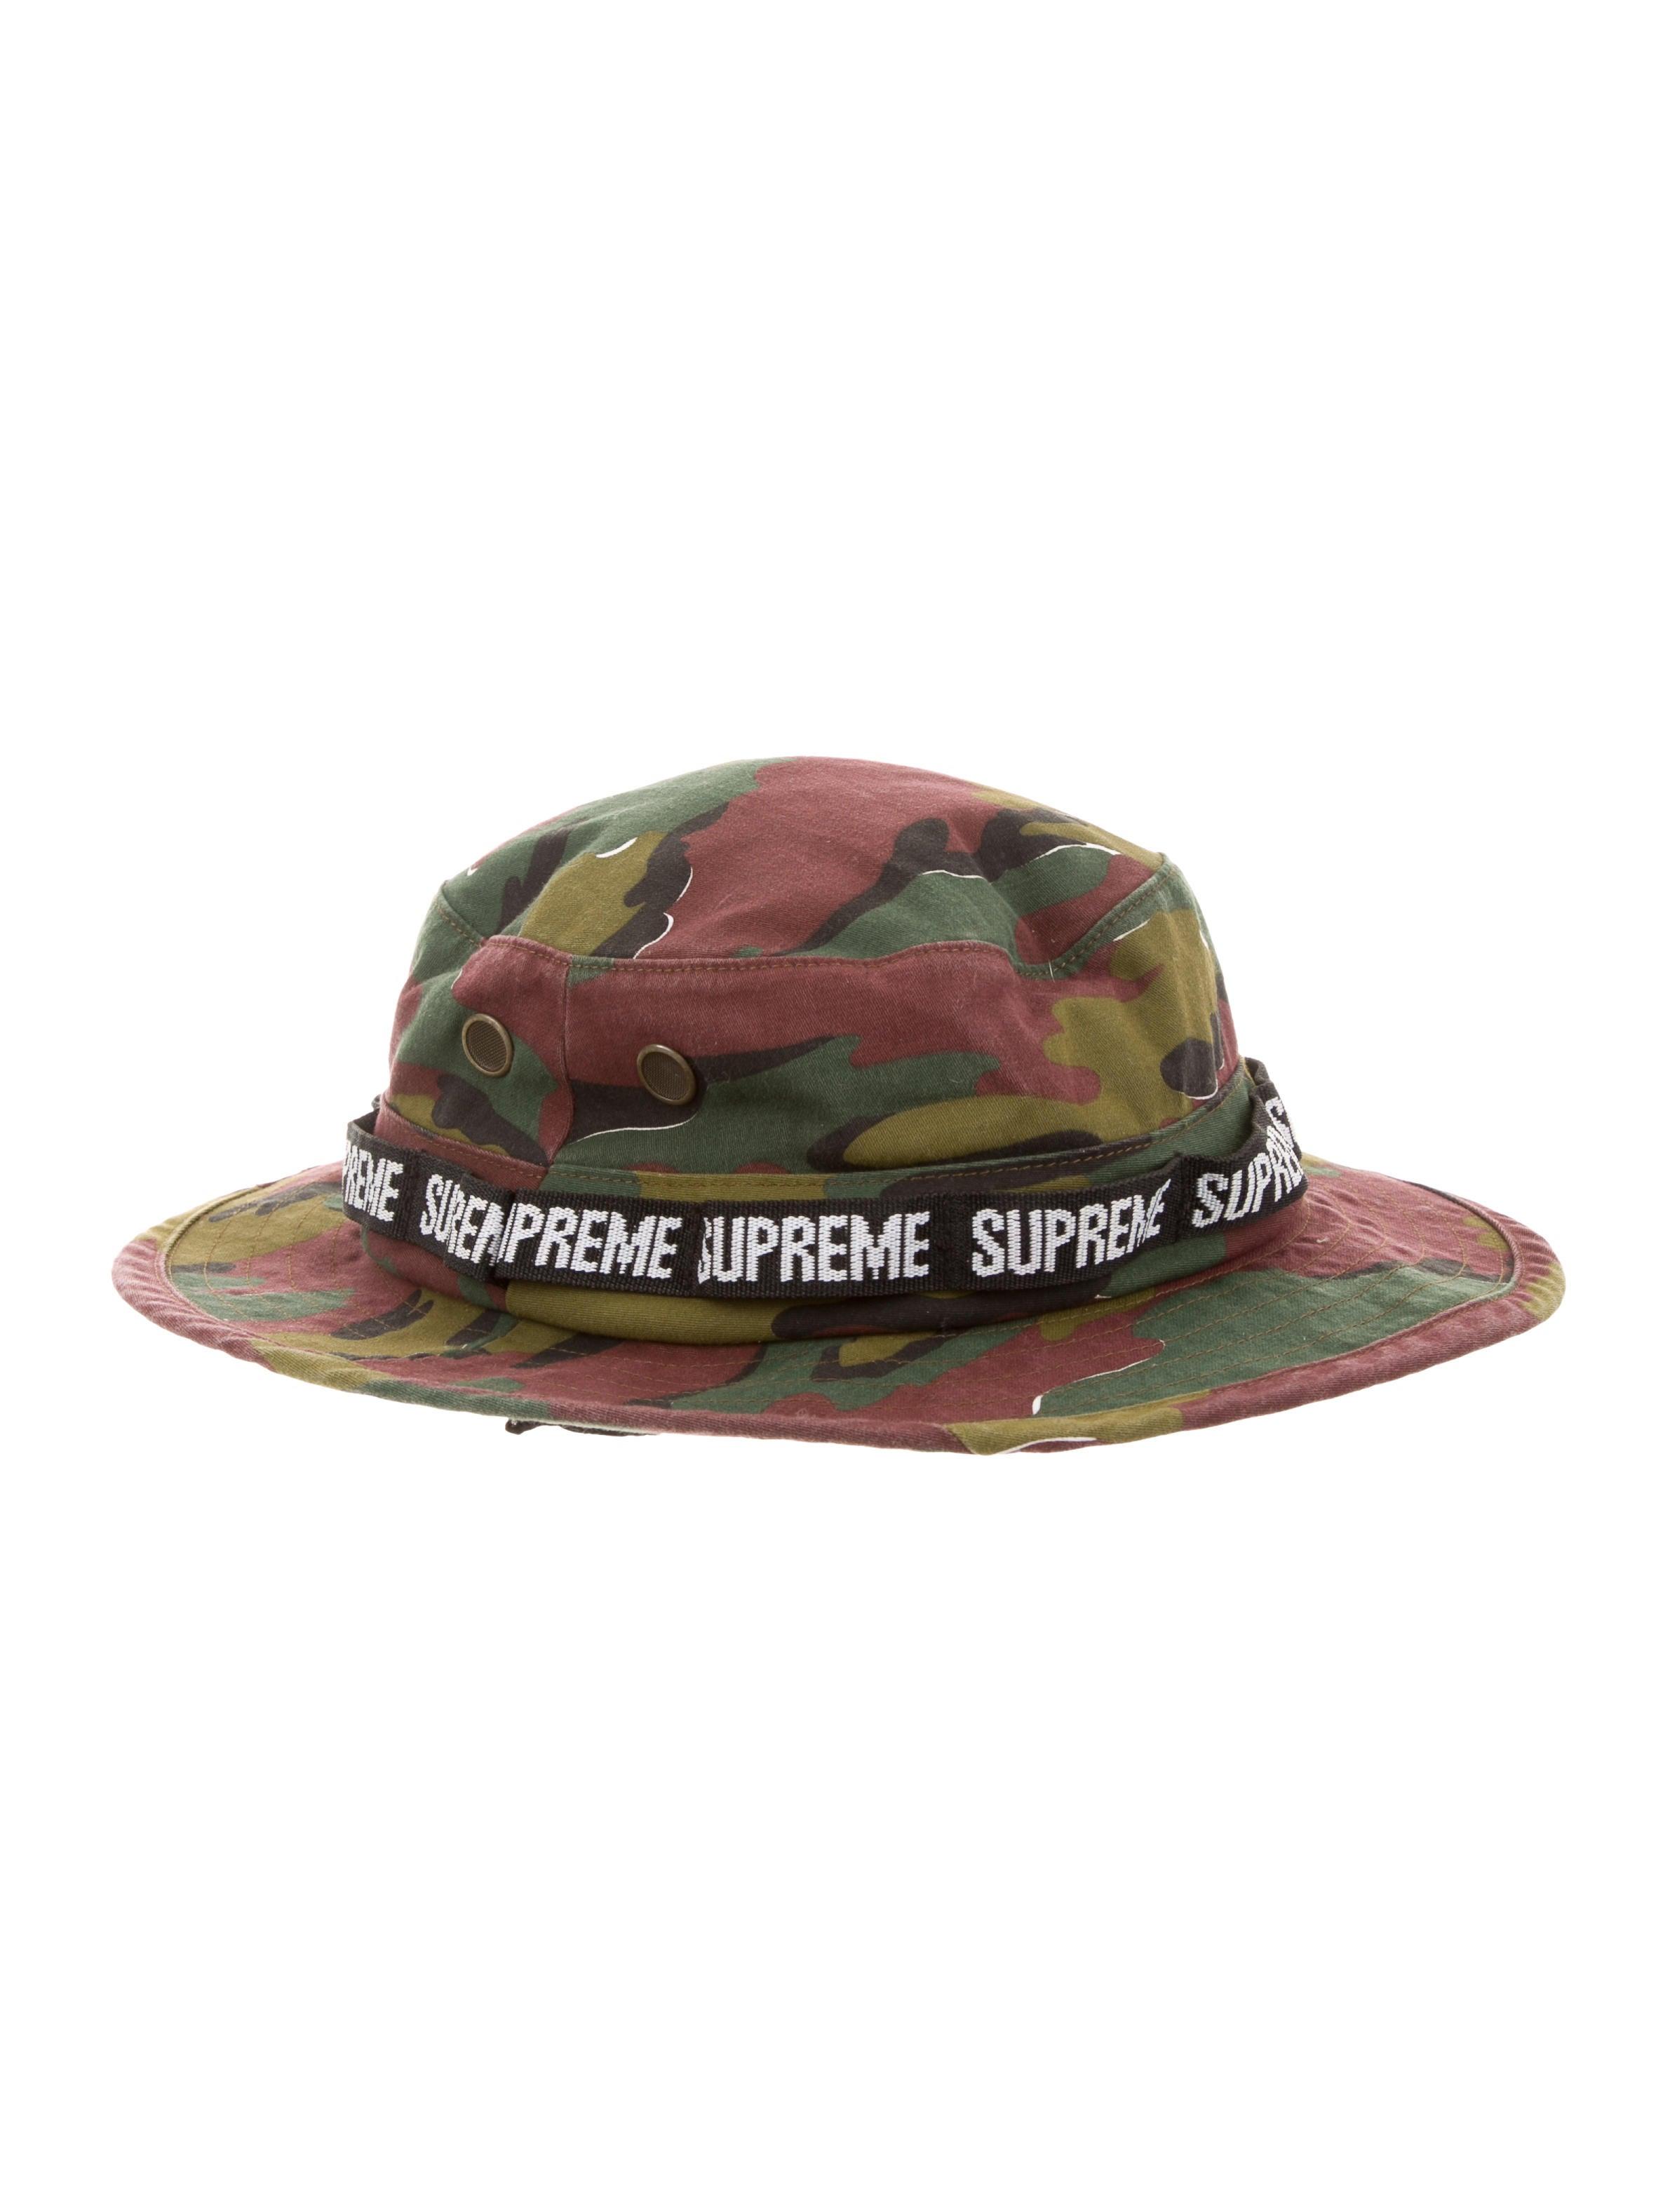 Supreme 2018 Military Boonie Hat w  Tags - Accessories - WSPME23708 ... 78bbcf7e6c0